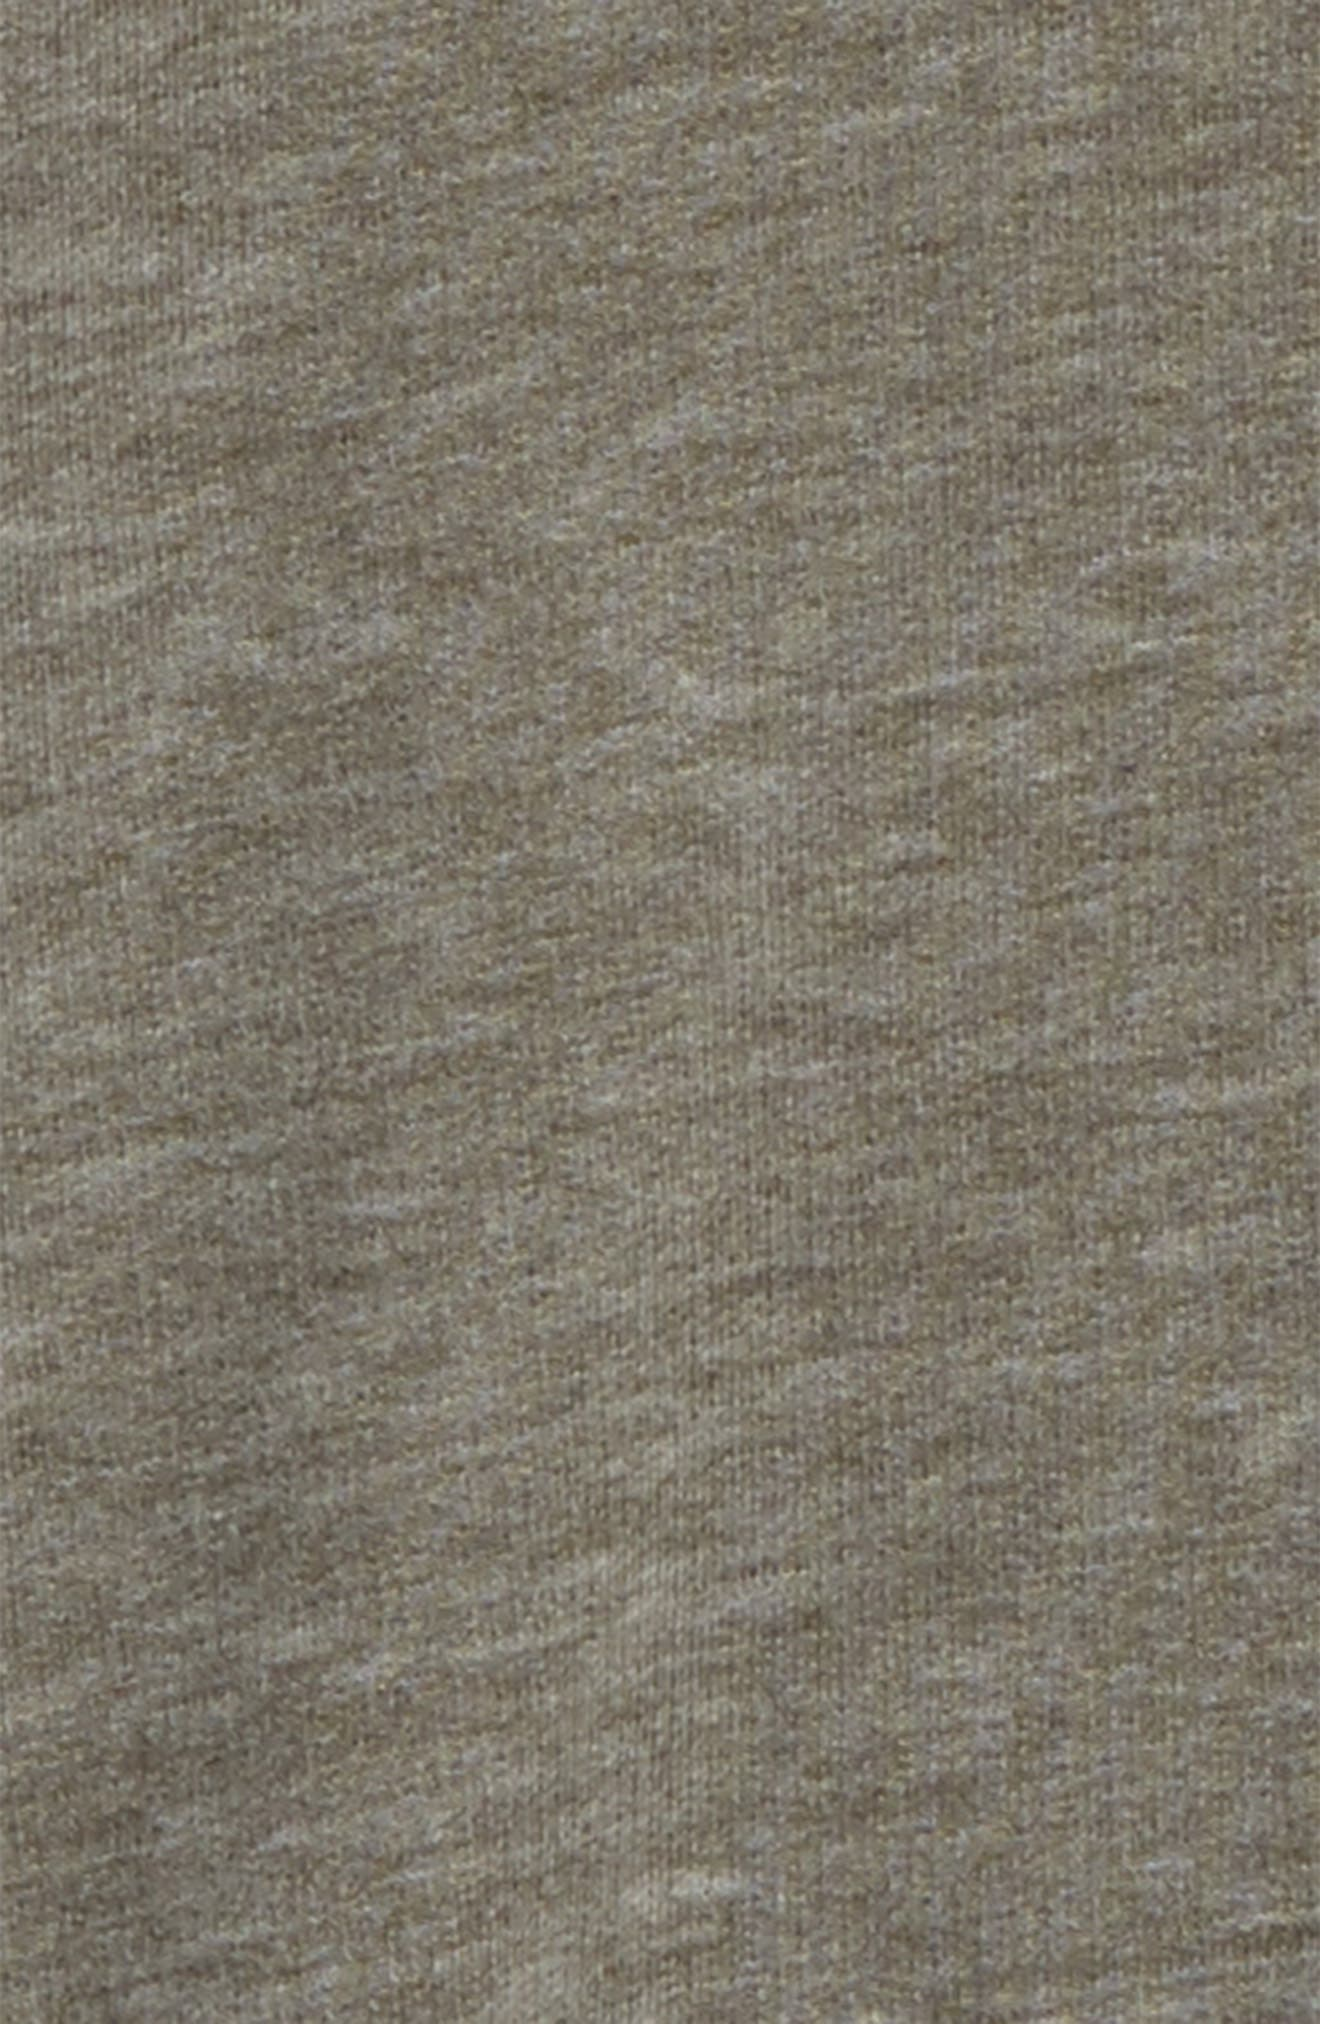 Mineral Wash Sweatshirt,                             Alternate thumbnail 2, color,                             310